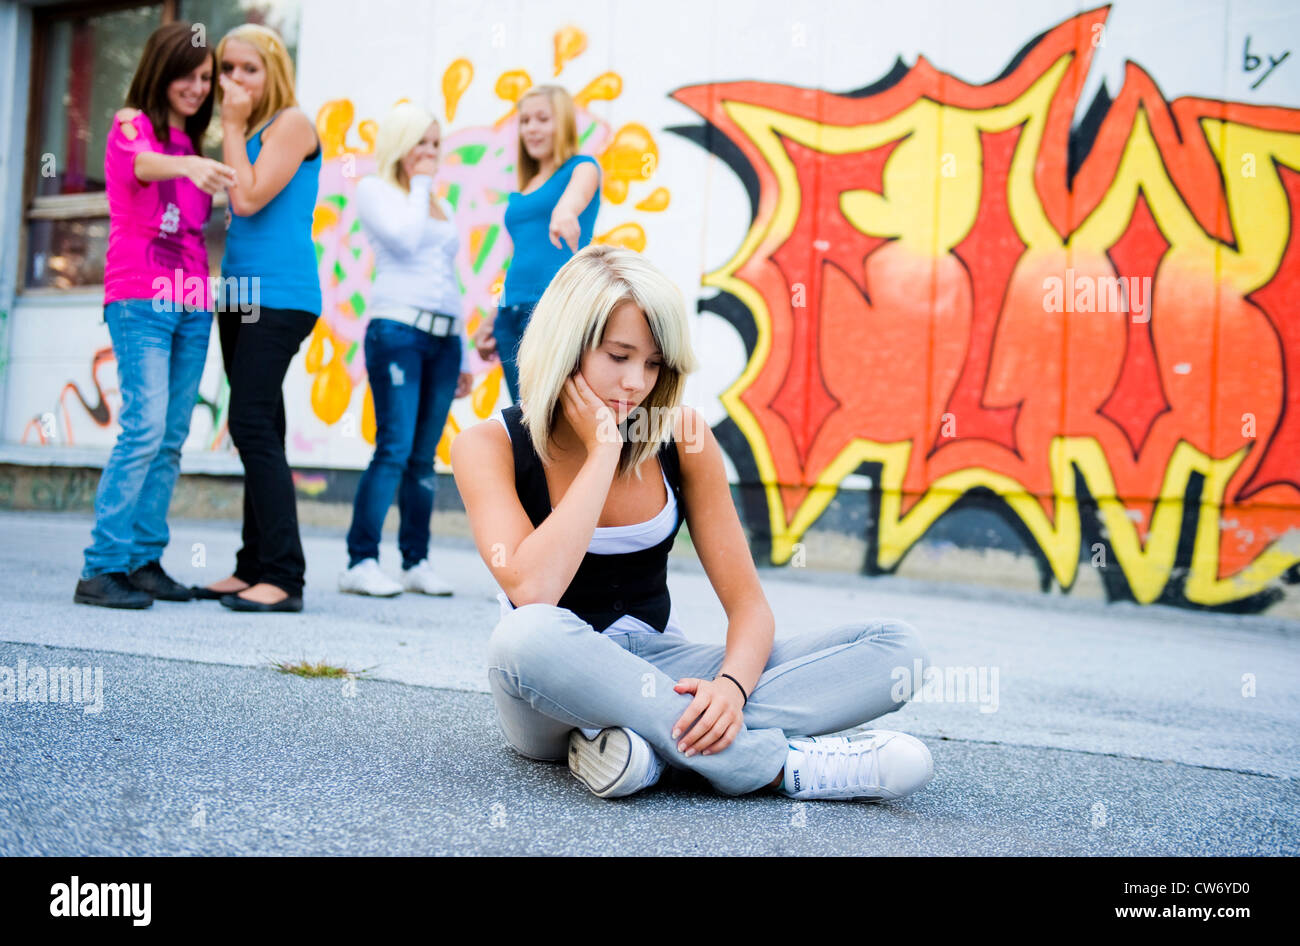 schoolgirl sitting in the schoolyard frustrated, schoolmates in the background slagging her off Stock Photo